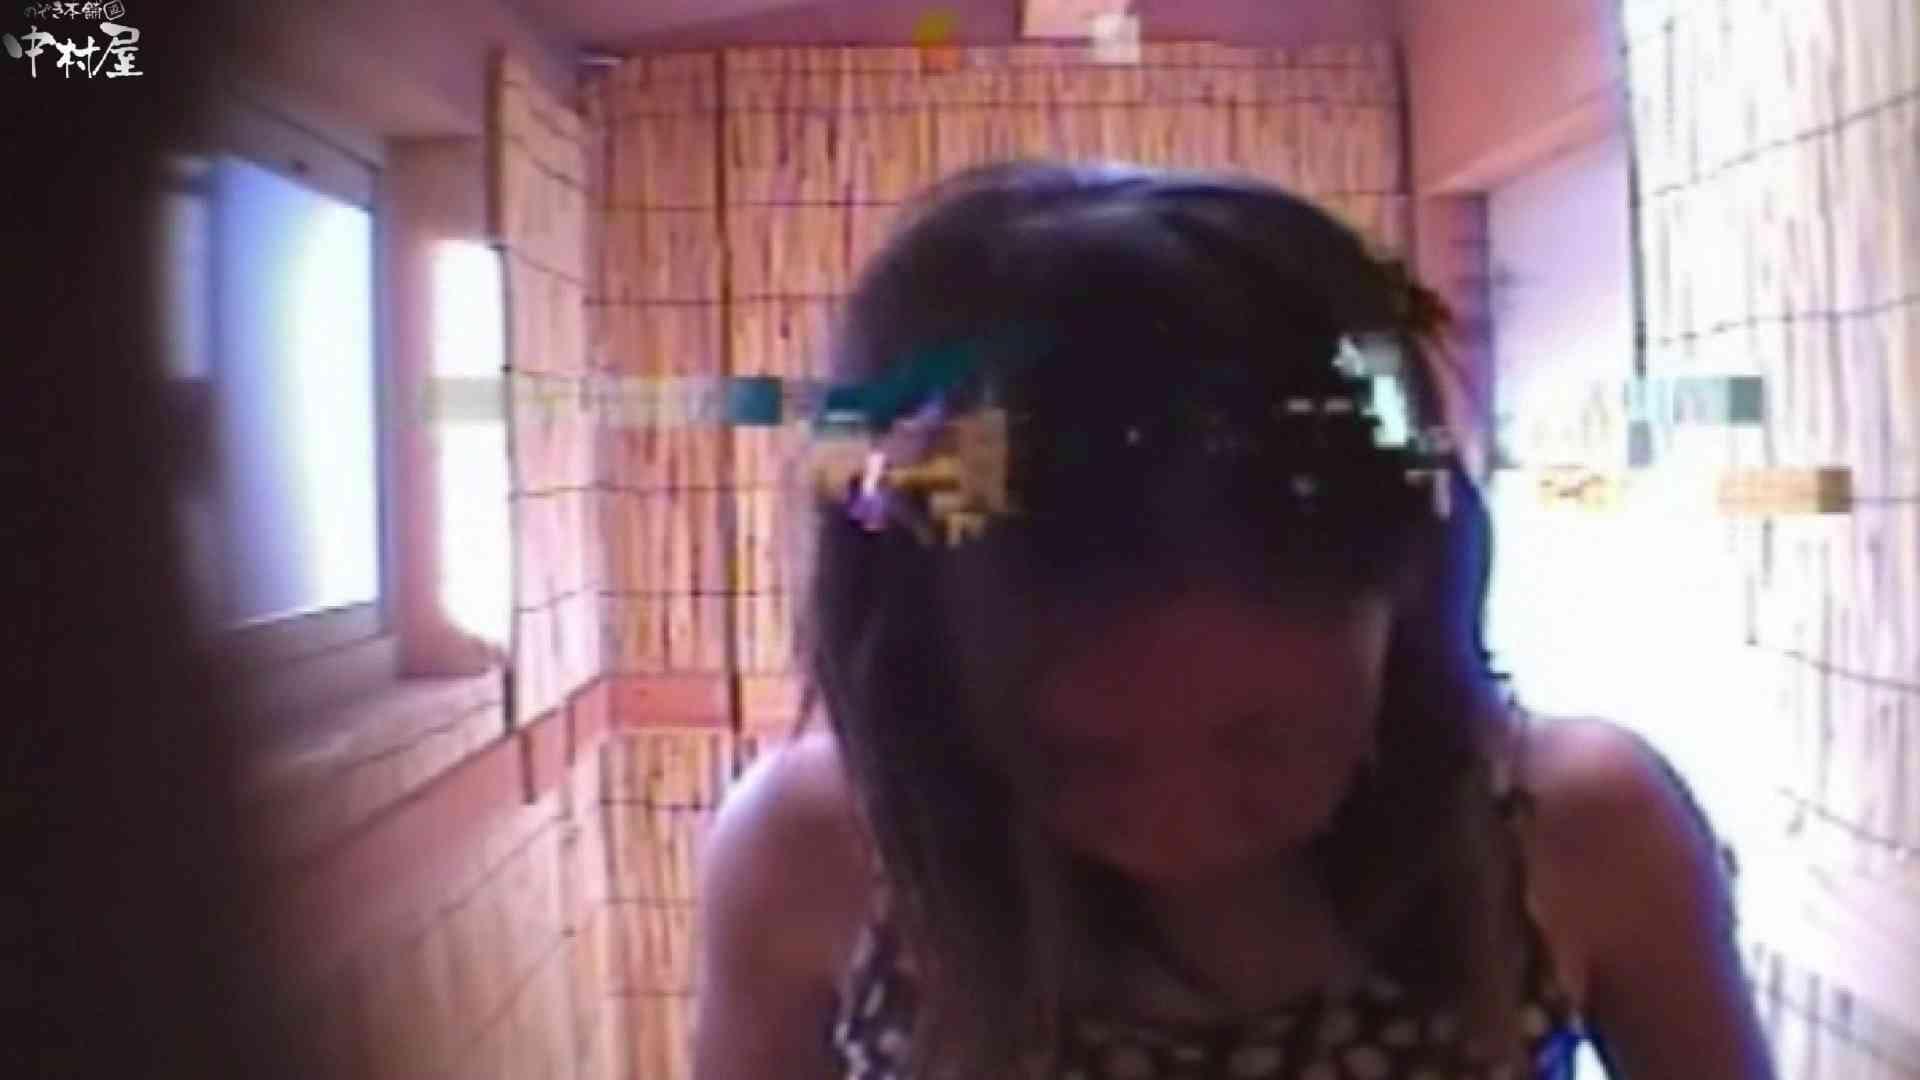 Summer beaches!Toilet peeping!Vol.01 人気シリーズ 盗み撮り動画 107PIX 38